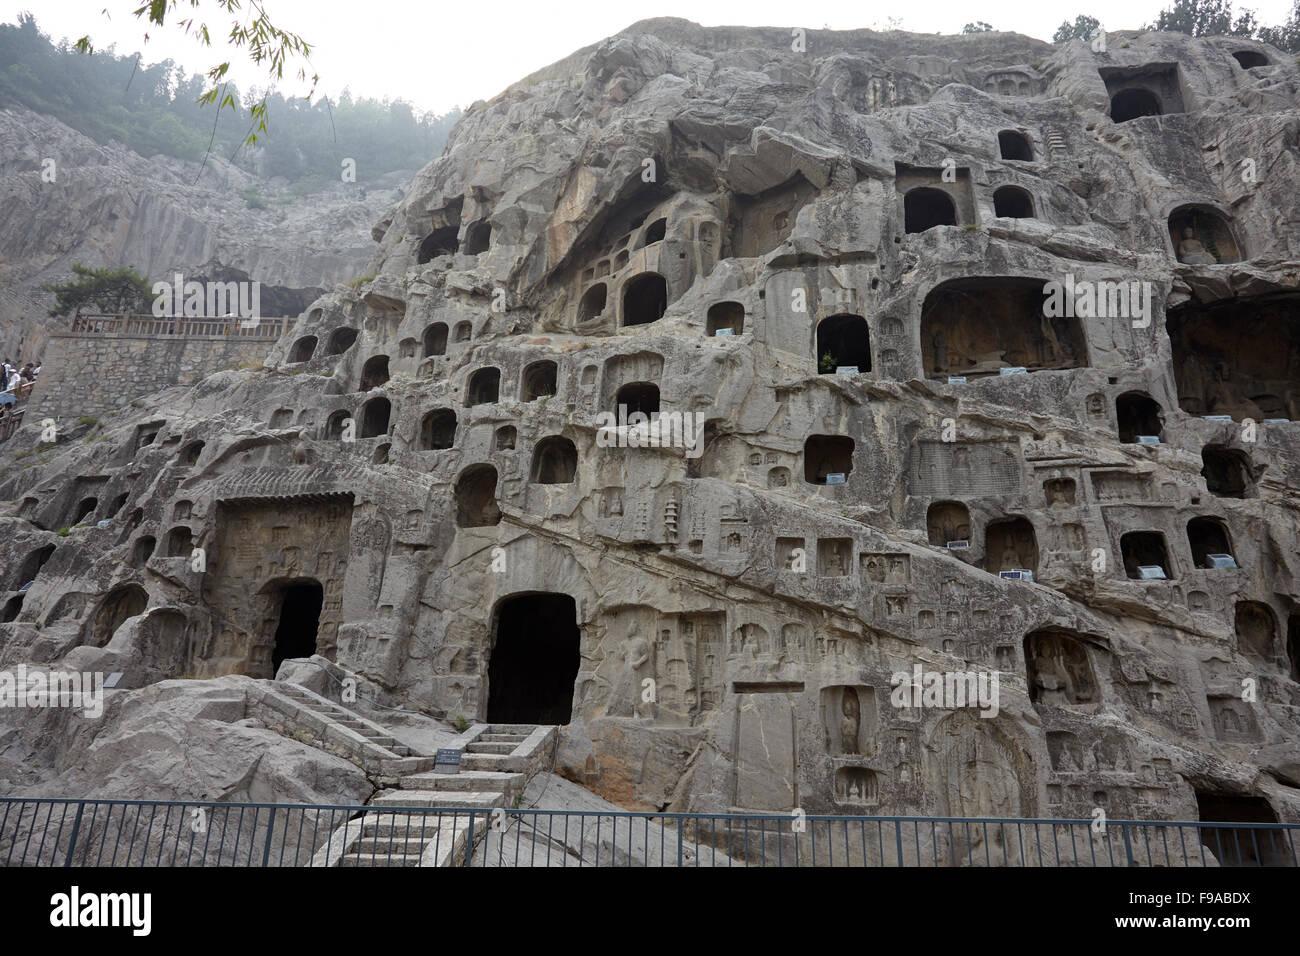 Longmen Grottoes, China - Stock Image